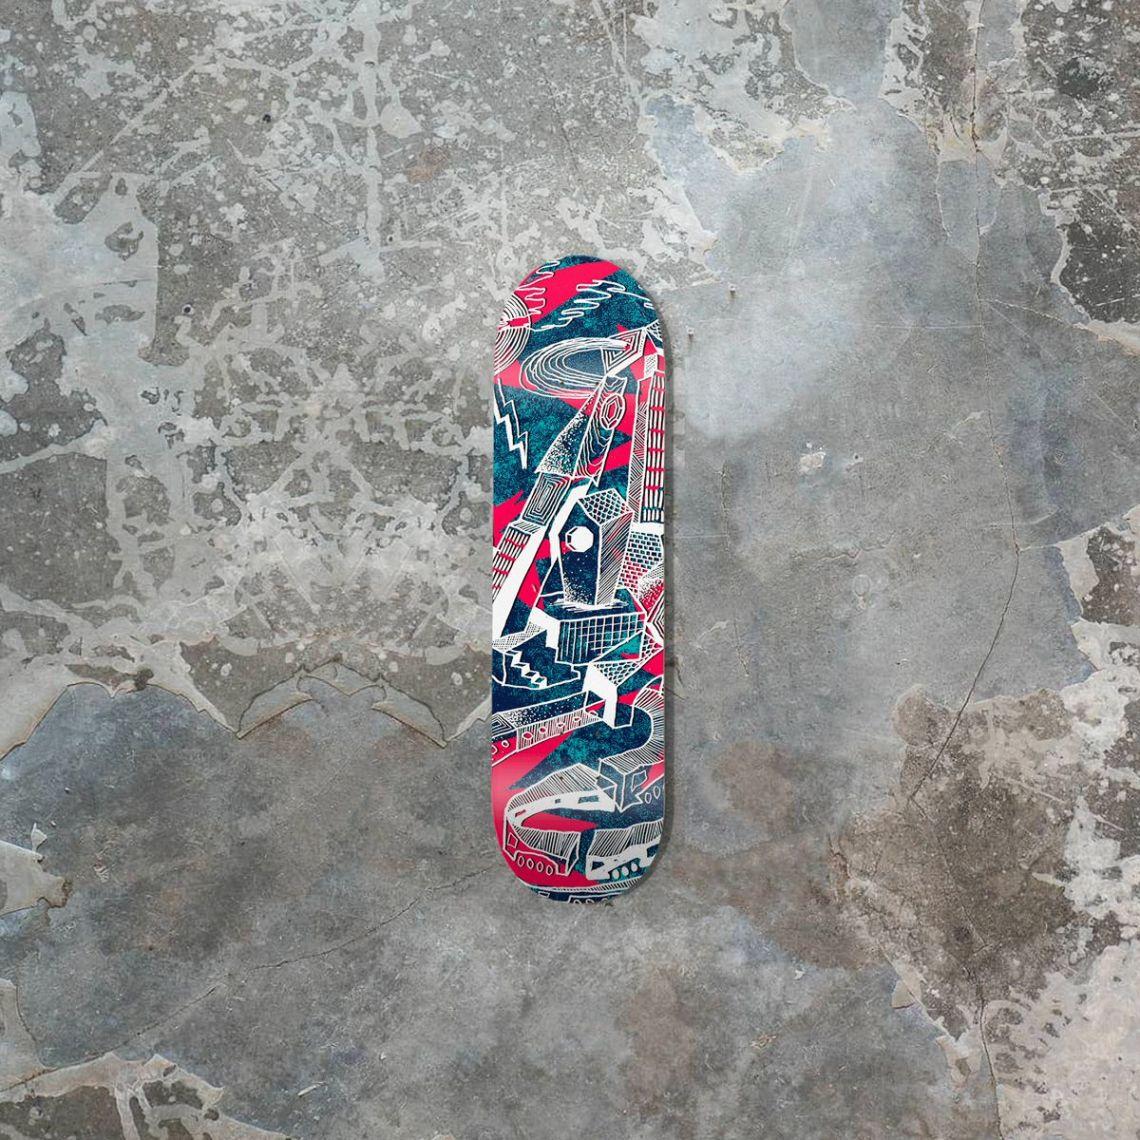 Combustion Series Par Roy Van Wezenbeek X Become Dkateboarding 1